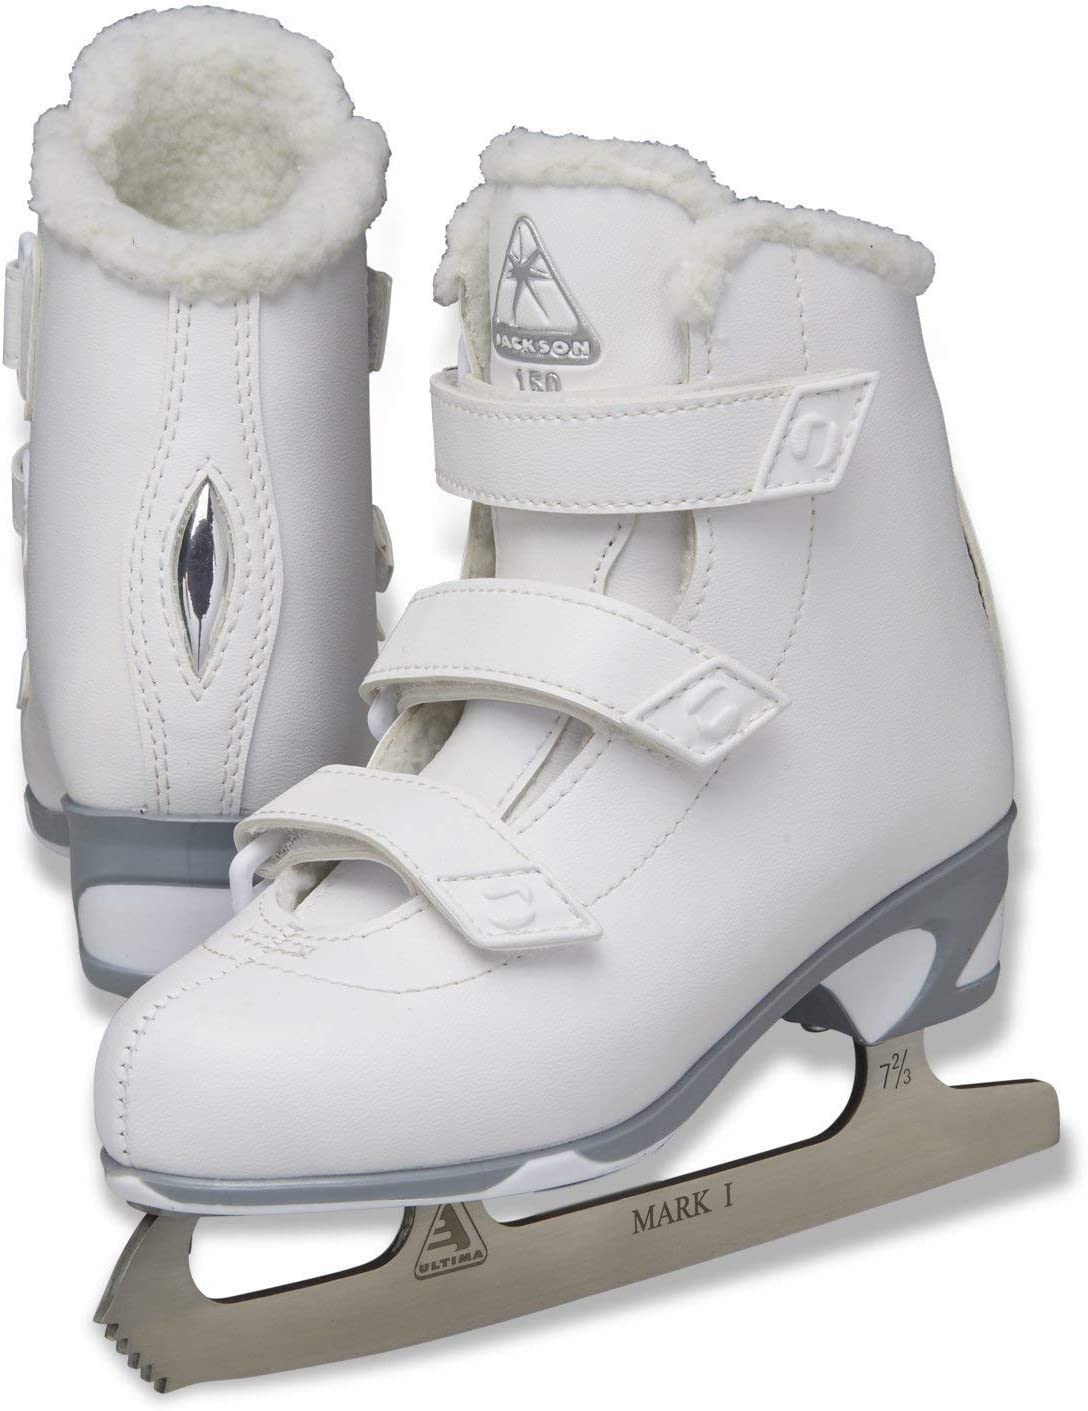 Jackson Ultima 正規逆輸入品 Finesse Girls Figure Skate 手数料無料 Velcro